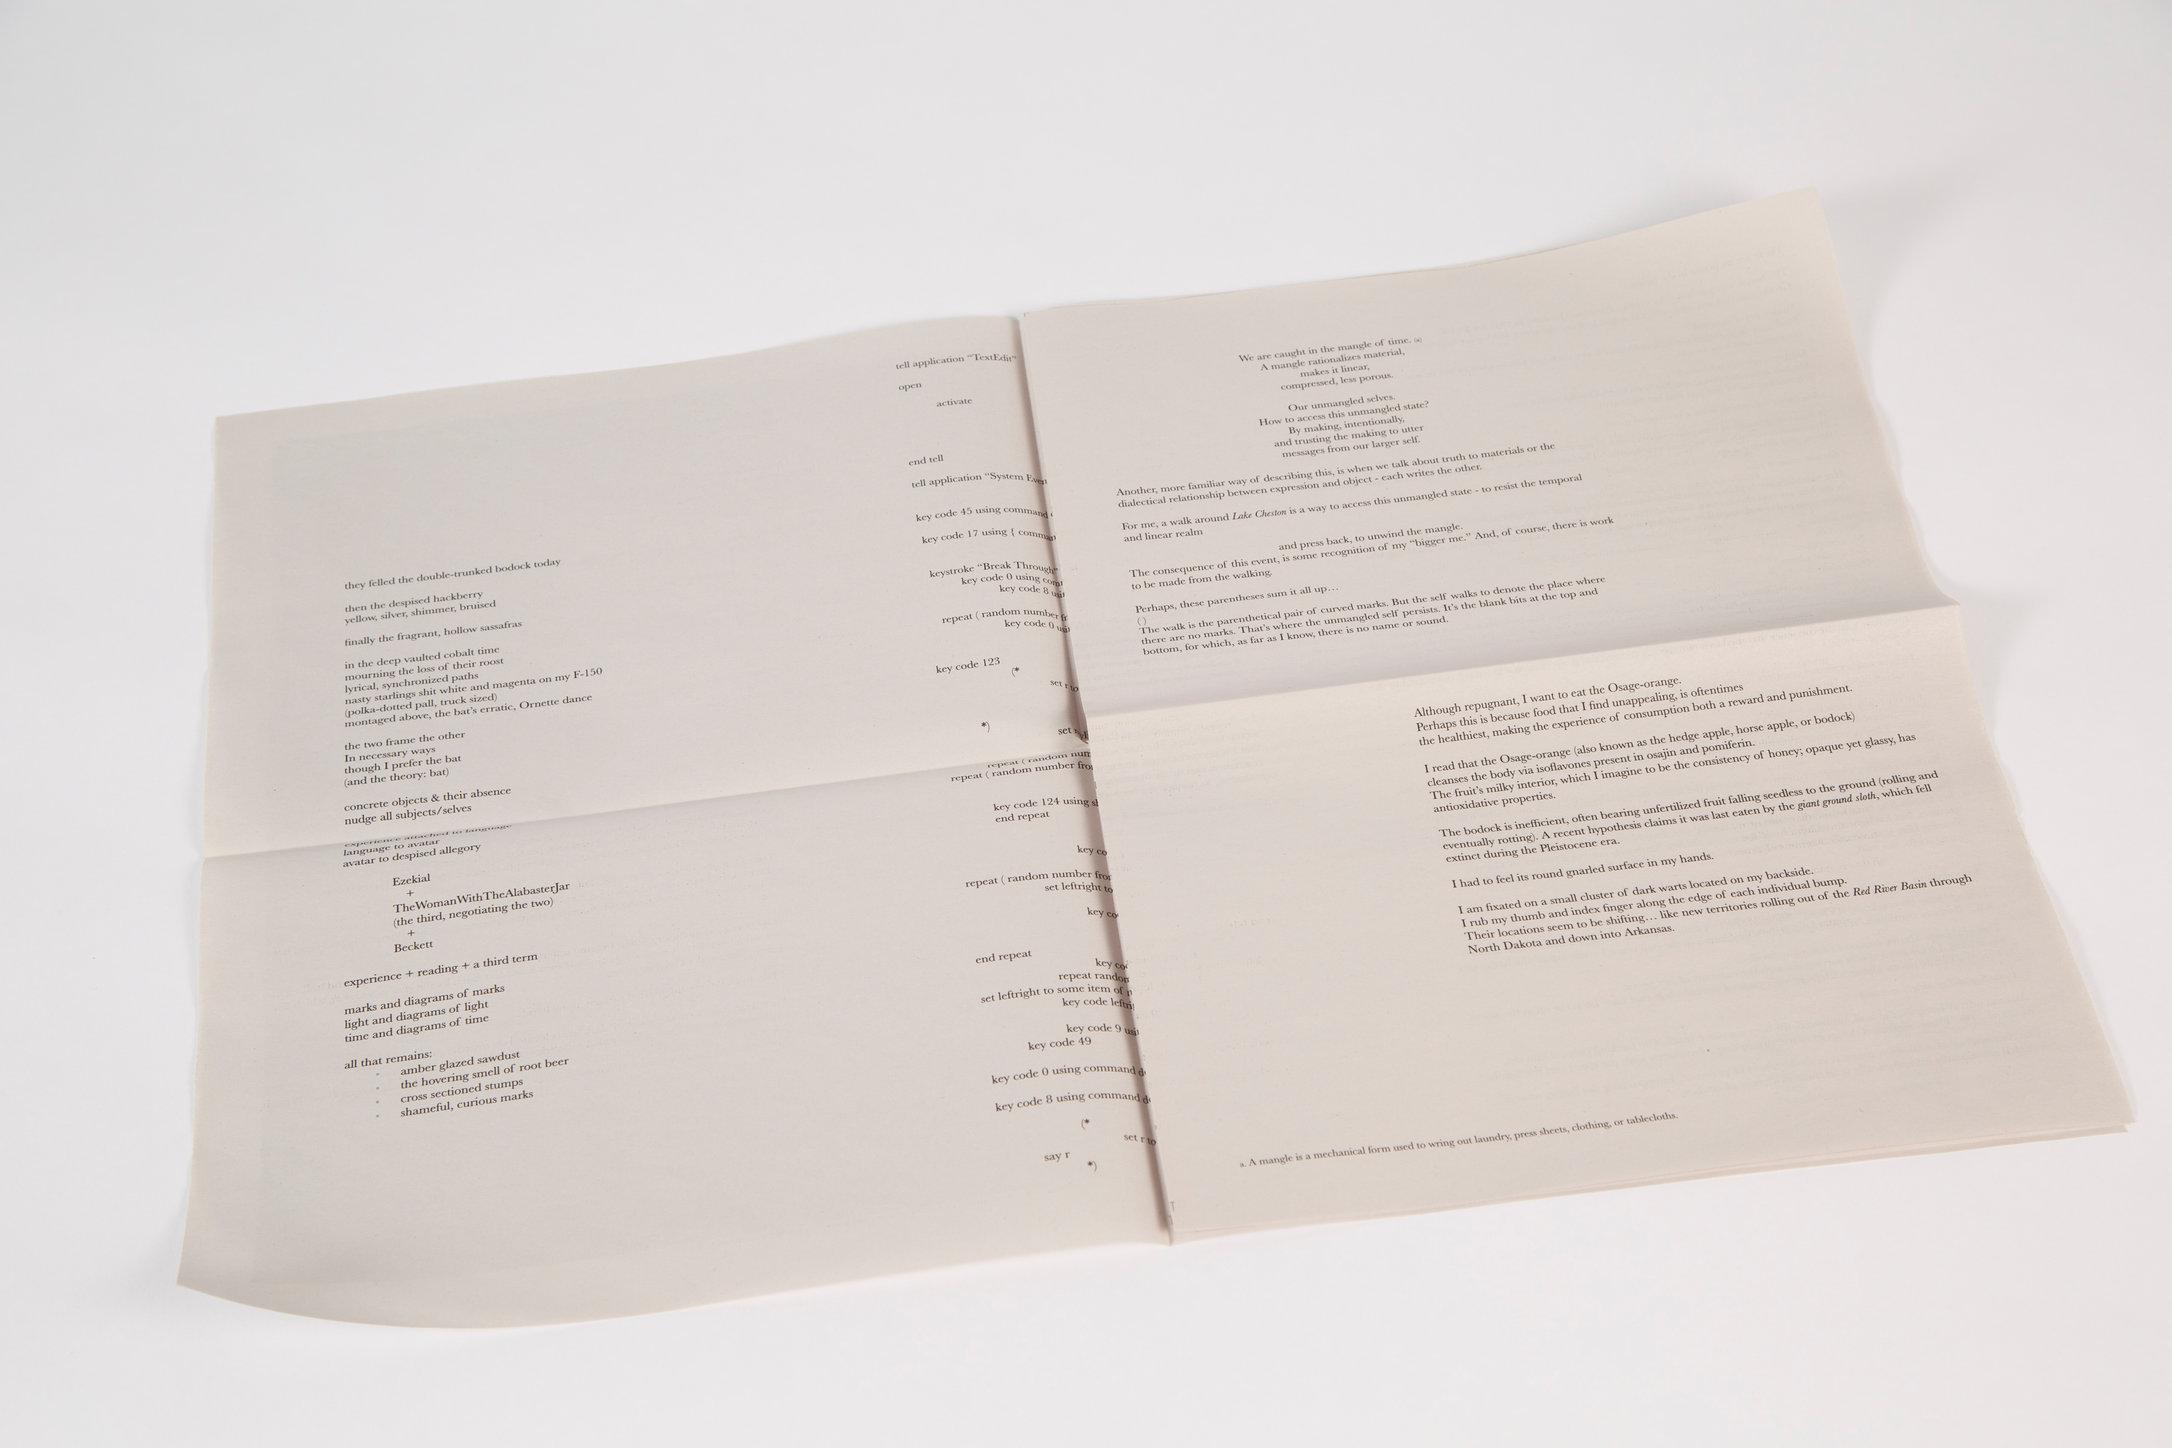 PD - Newspapers-9588.jpg